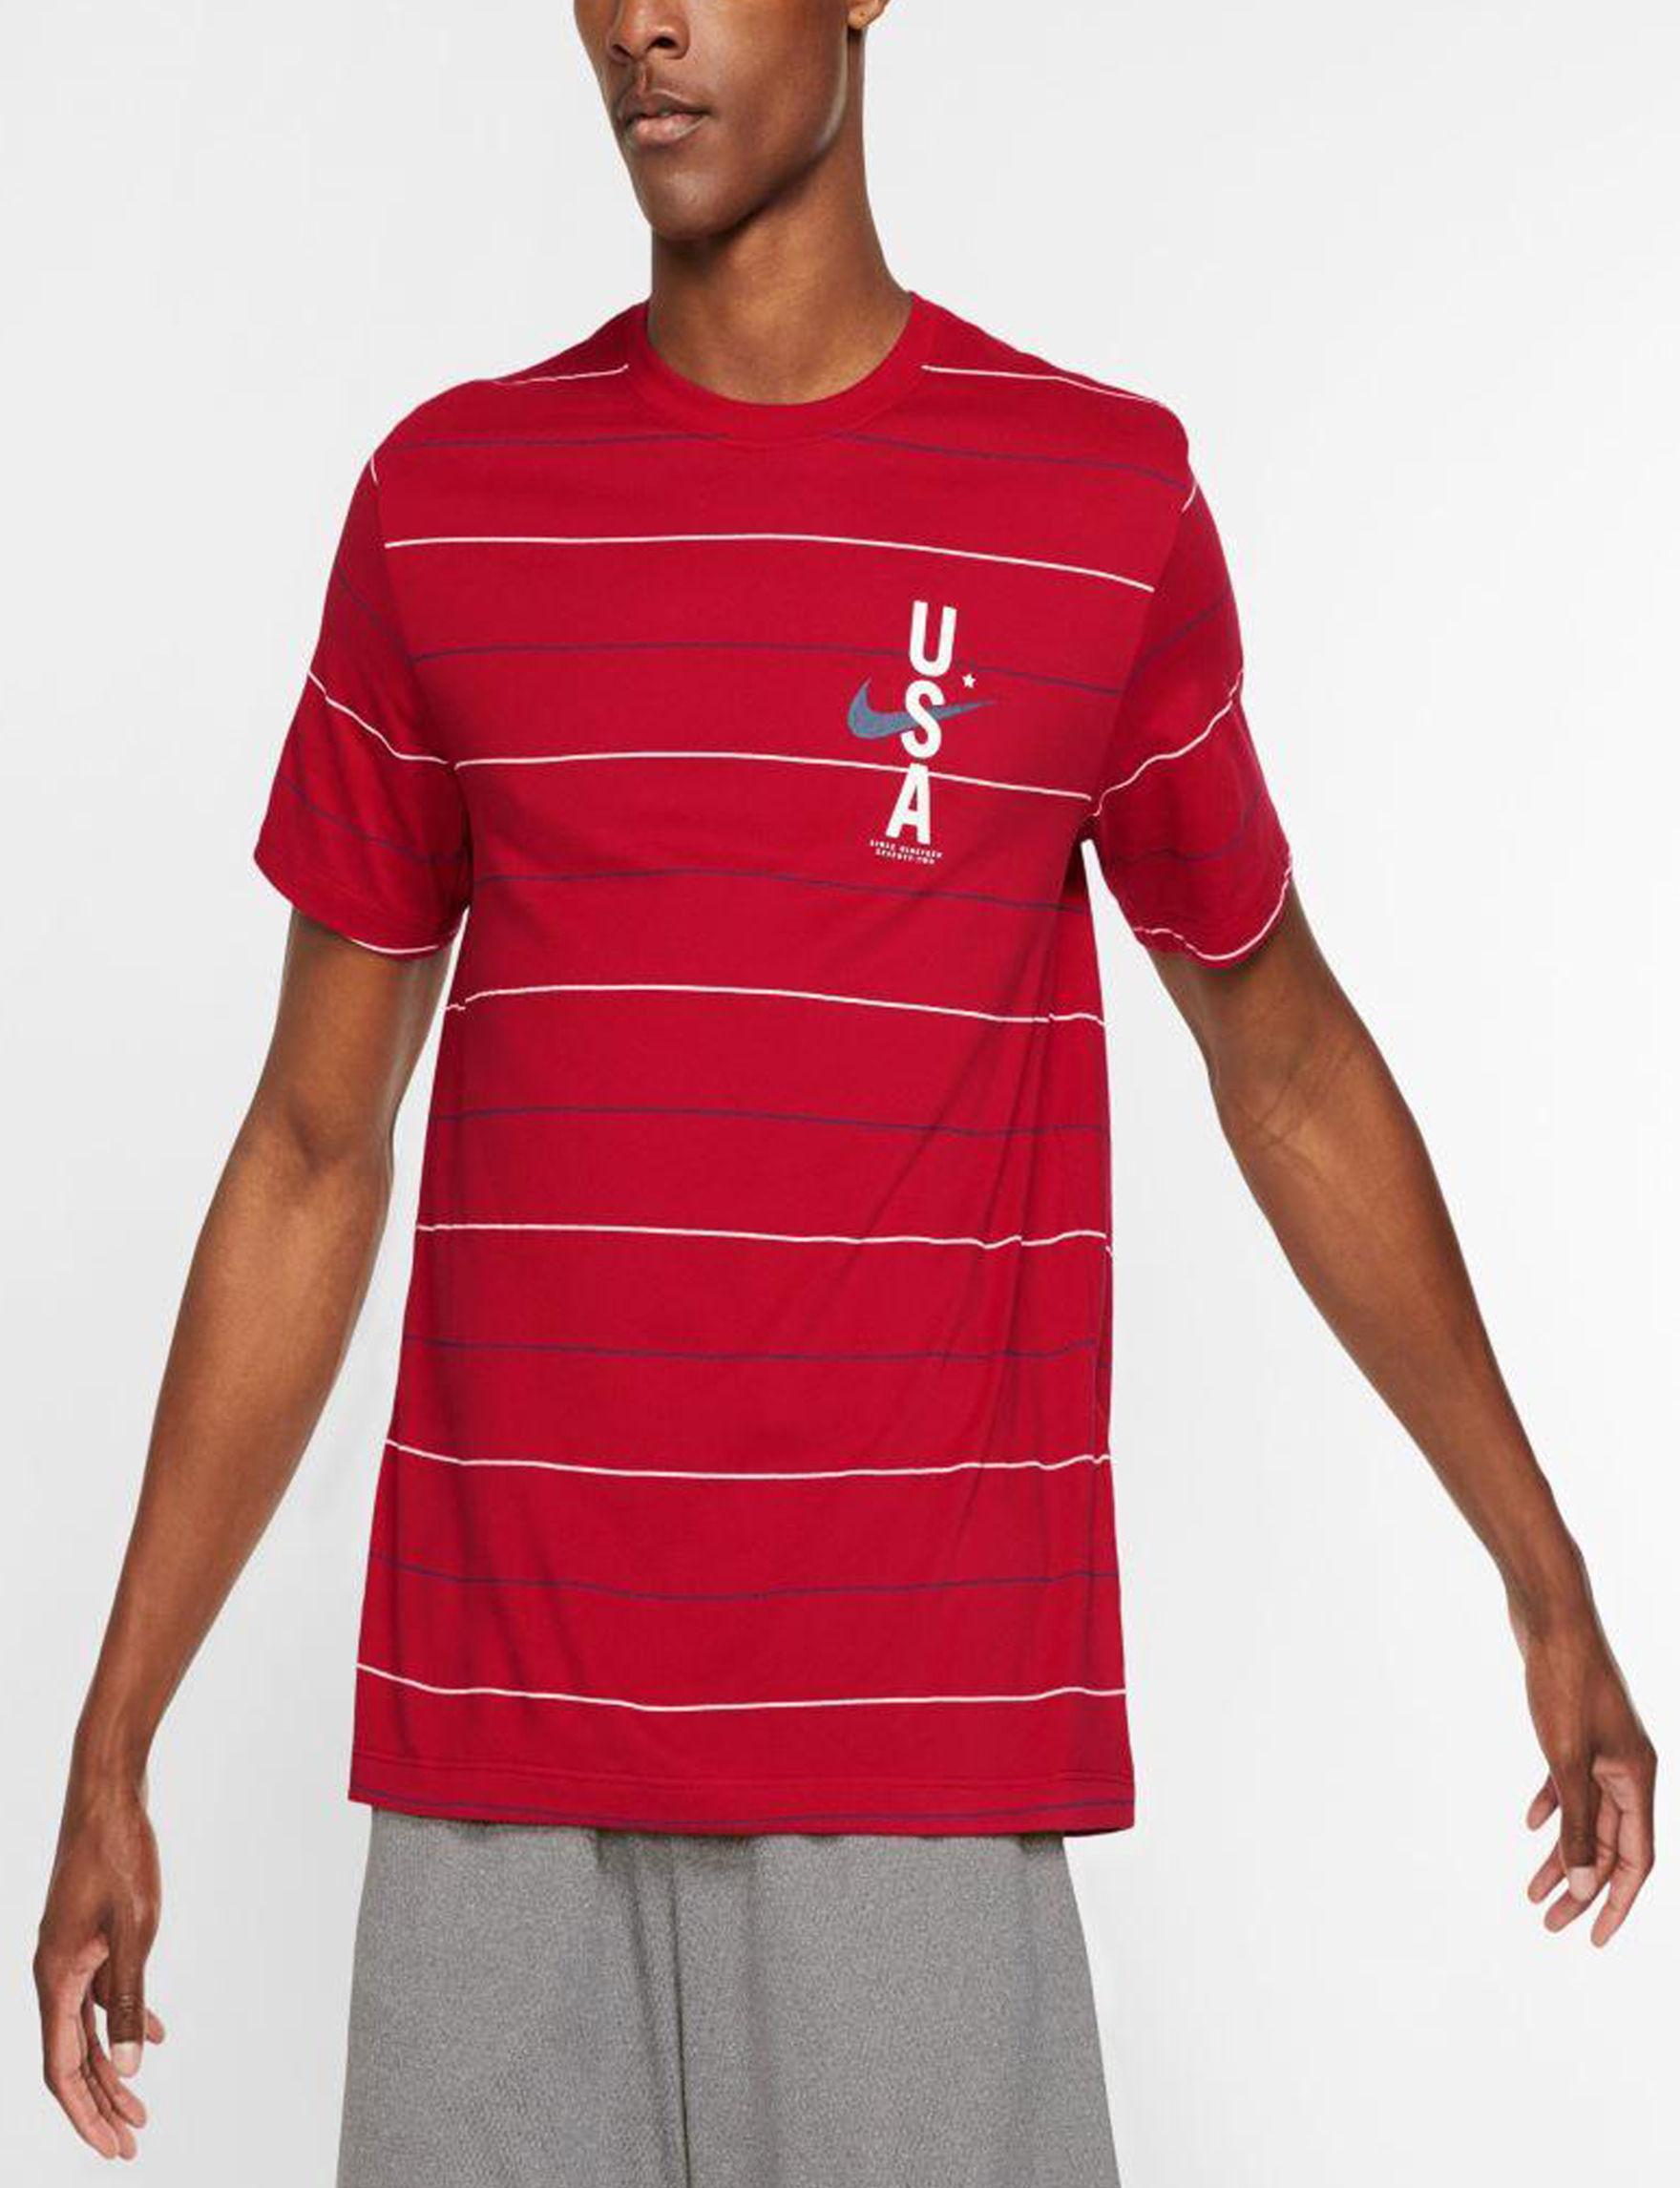 Nike Gym Red Tees & Tanks